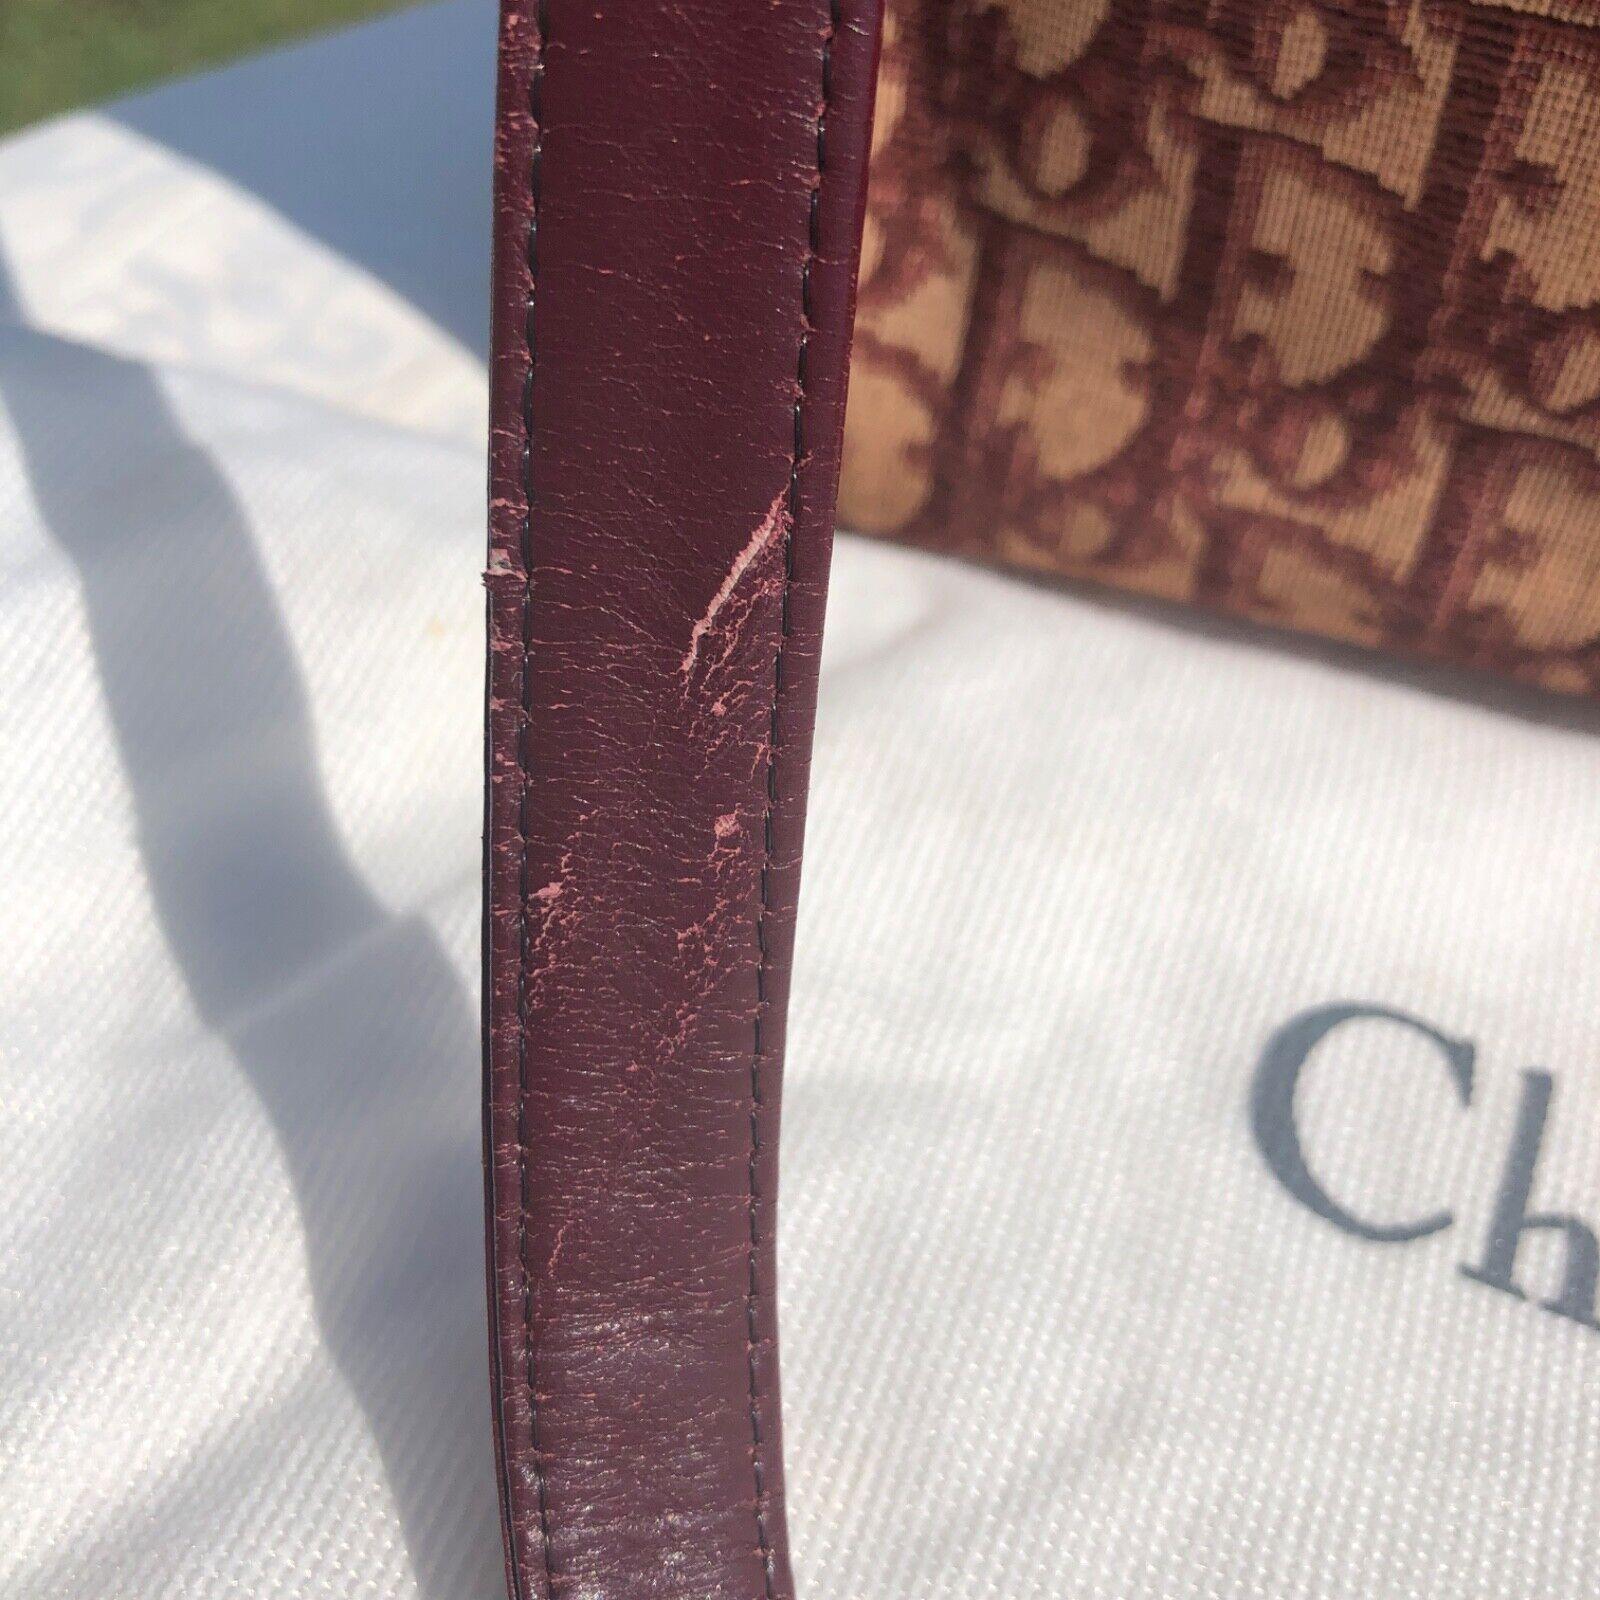 Sac christian dior vintage toile jacquard bordeaux french bag monogram